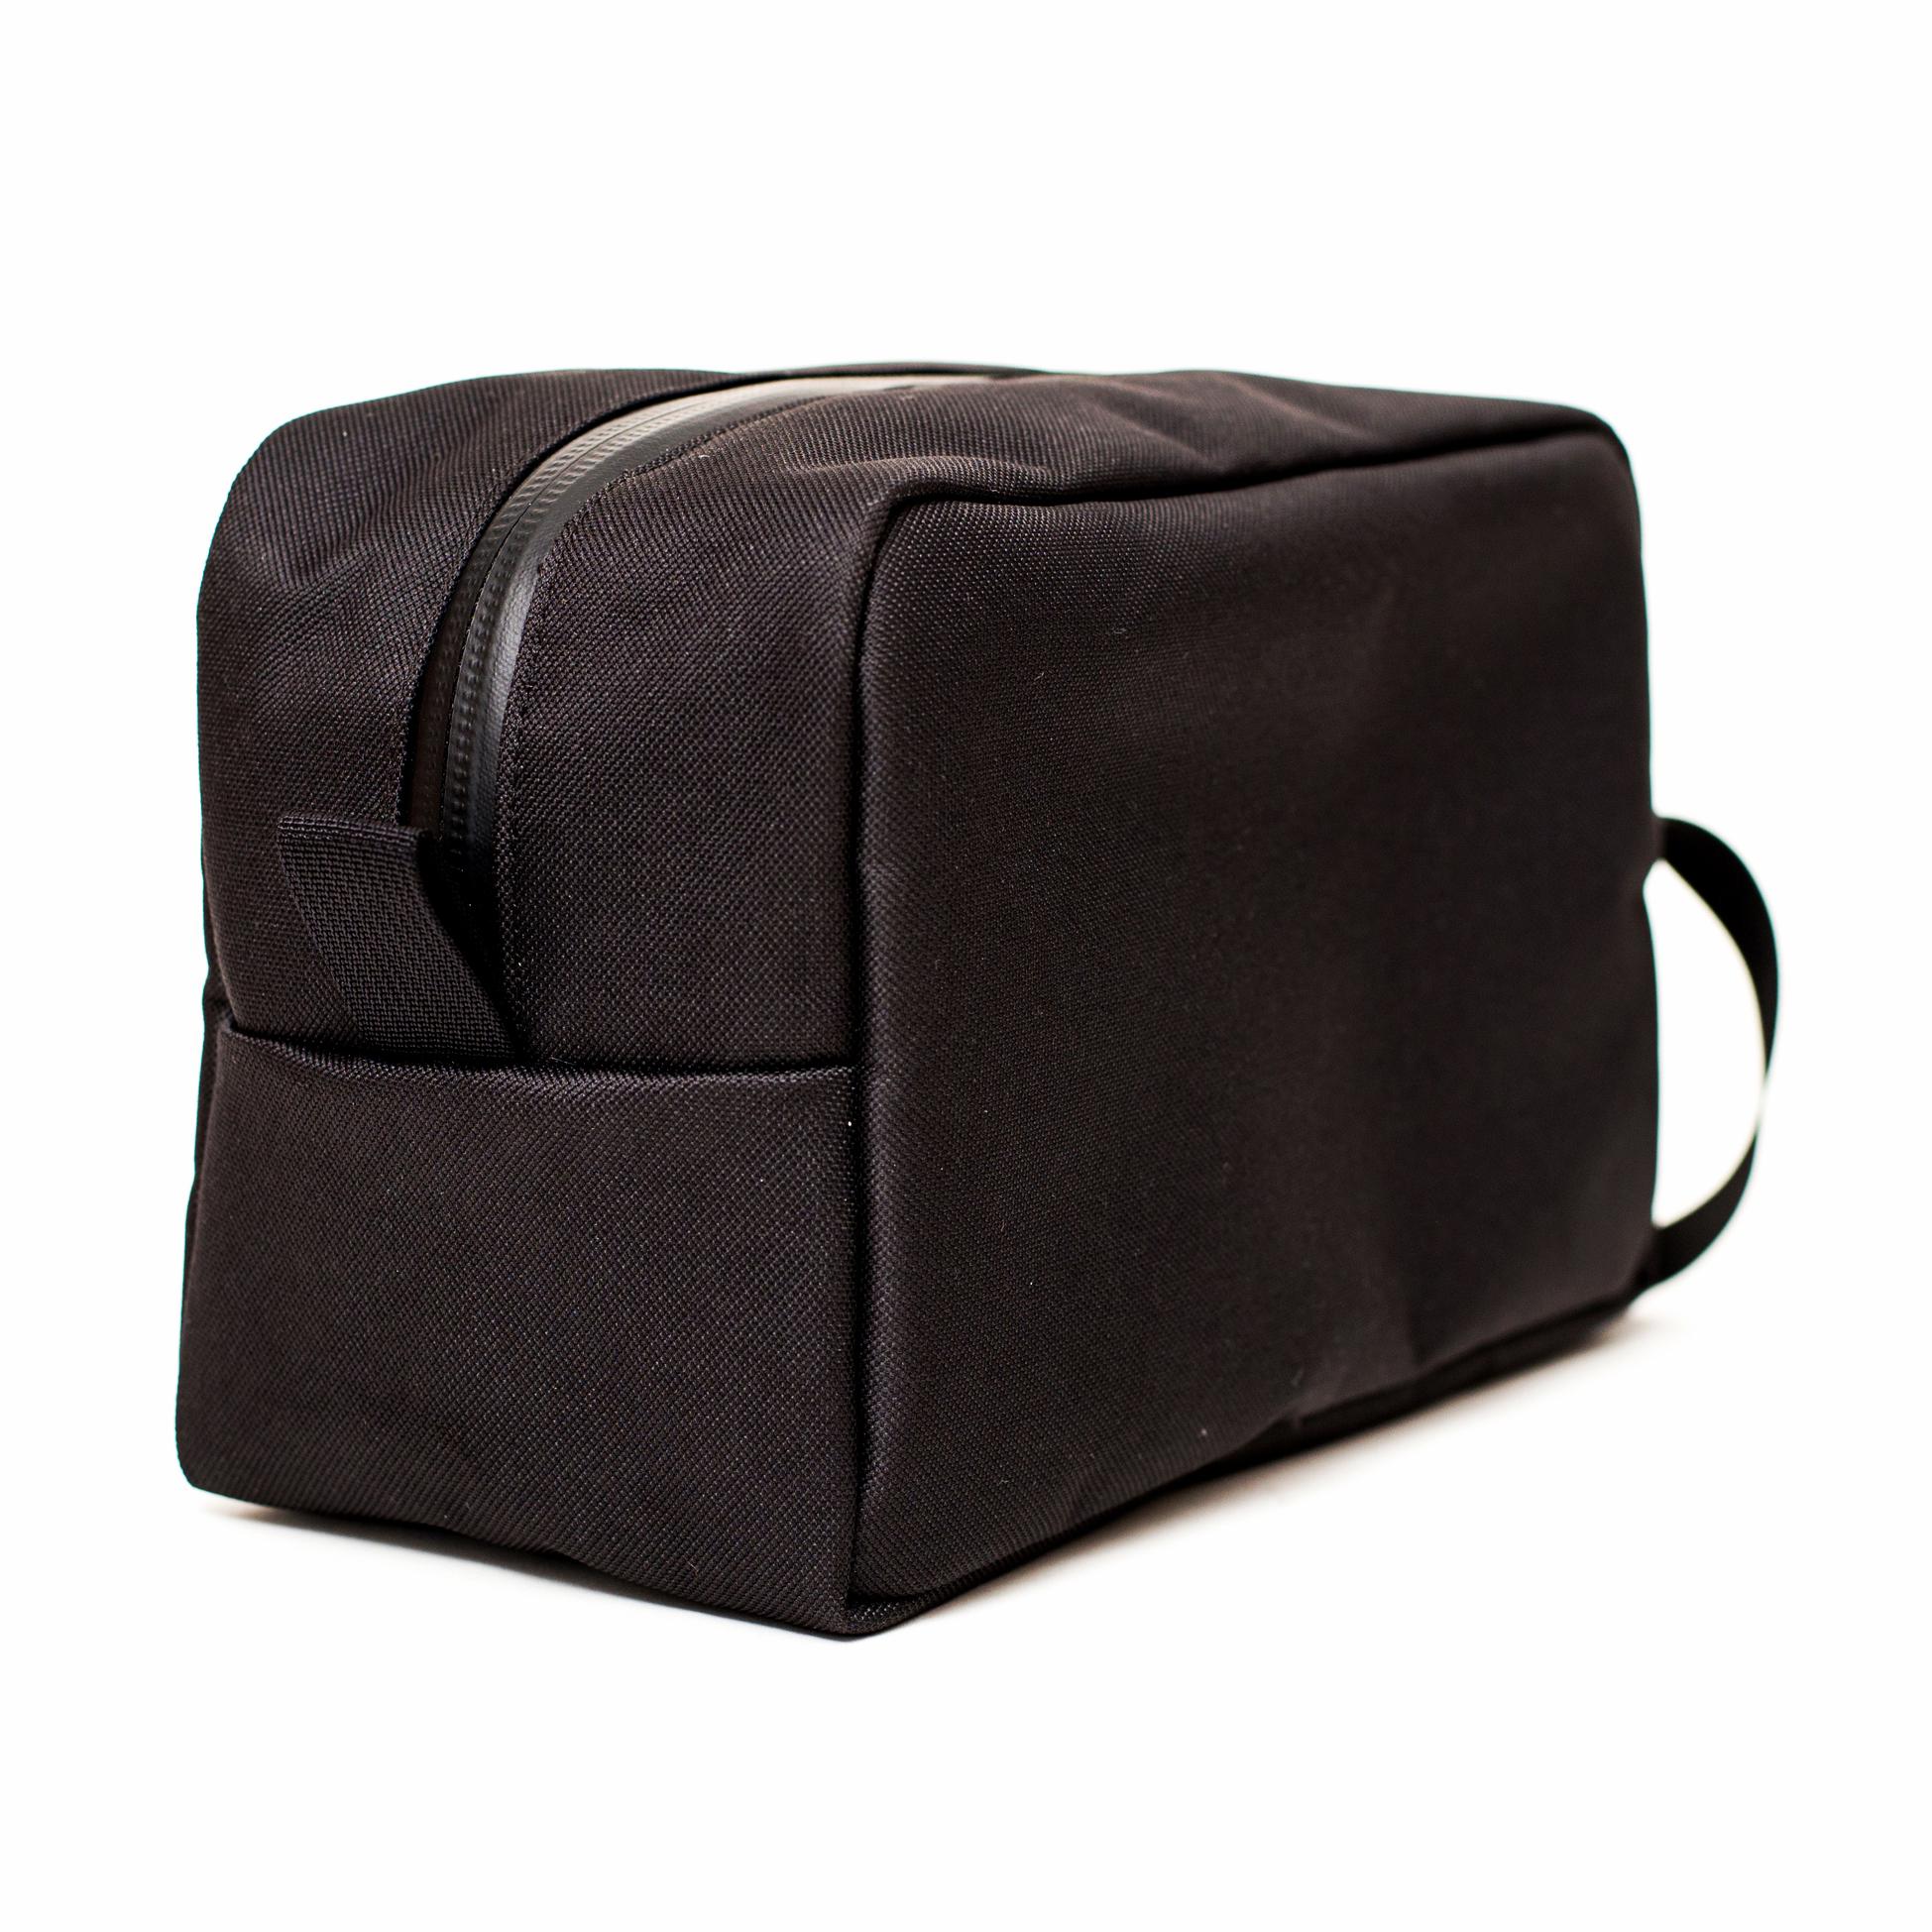 Buy Abscent - Toilet Bag - Black